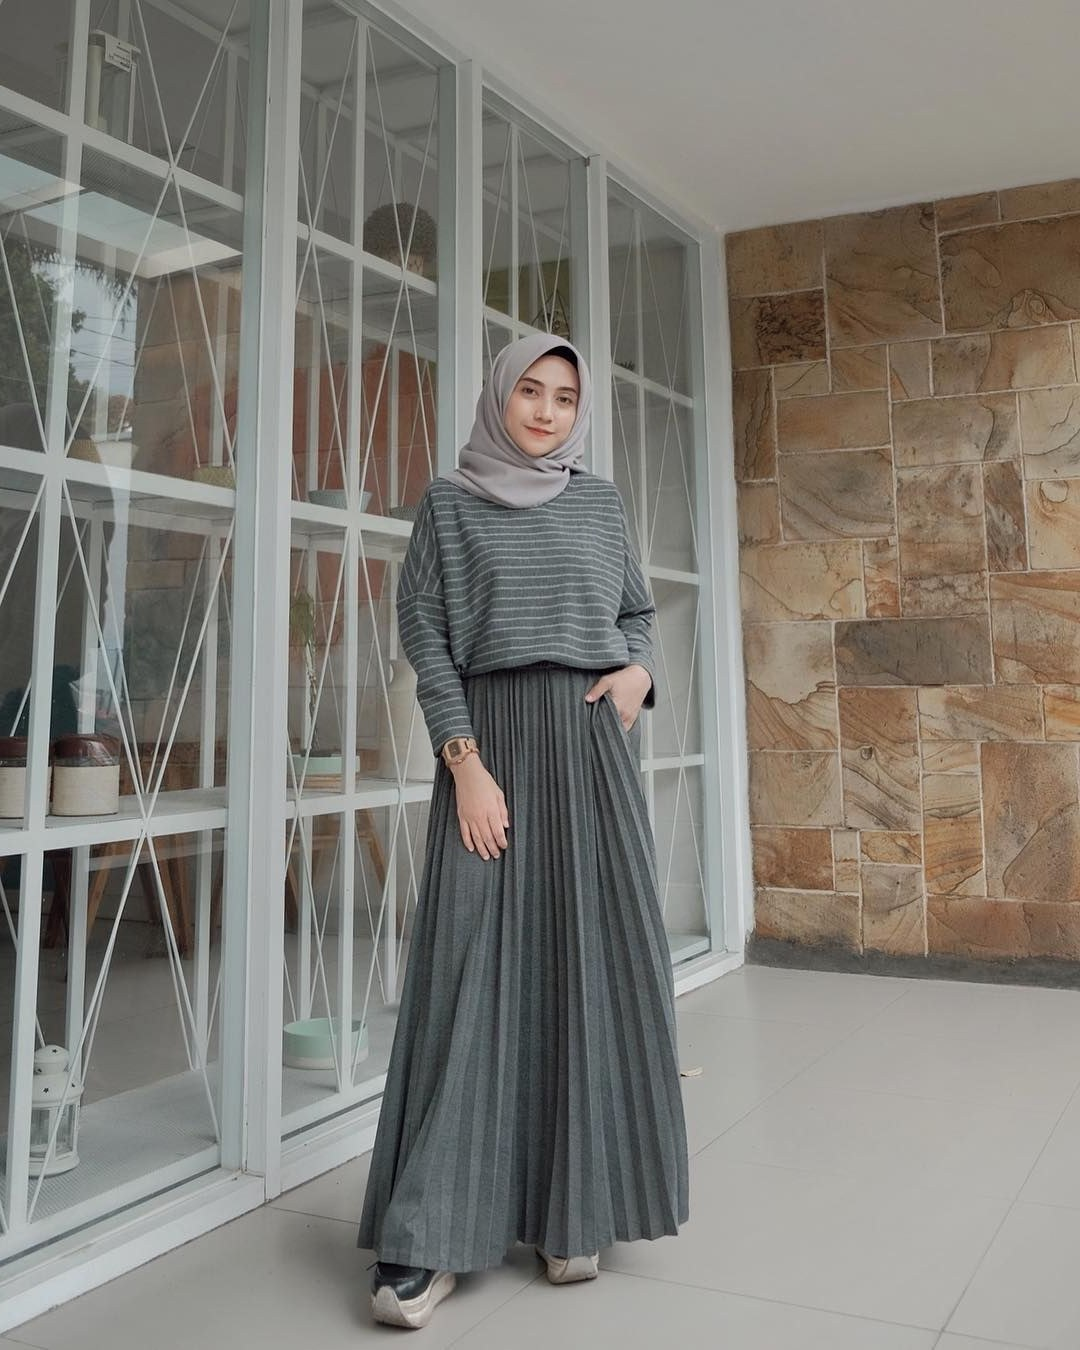 Bentuk Fashion Baju Lebaran Qwdq Baju Muslim Lebaran Terbaru 2019 Dengan Gambar